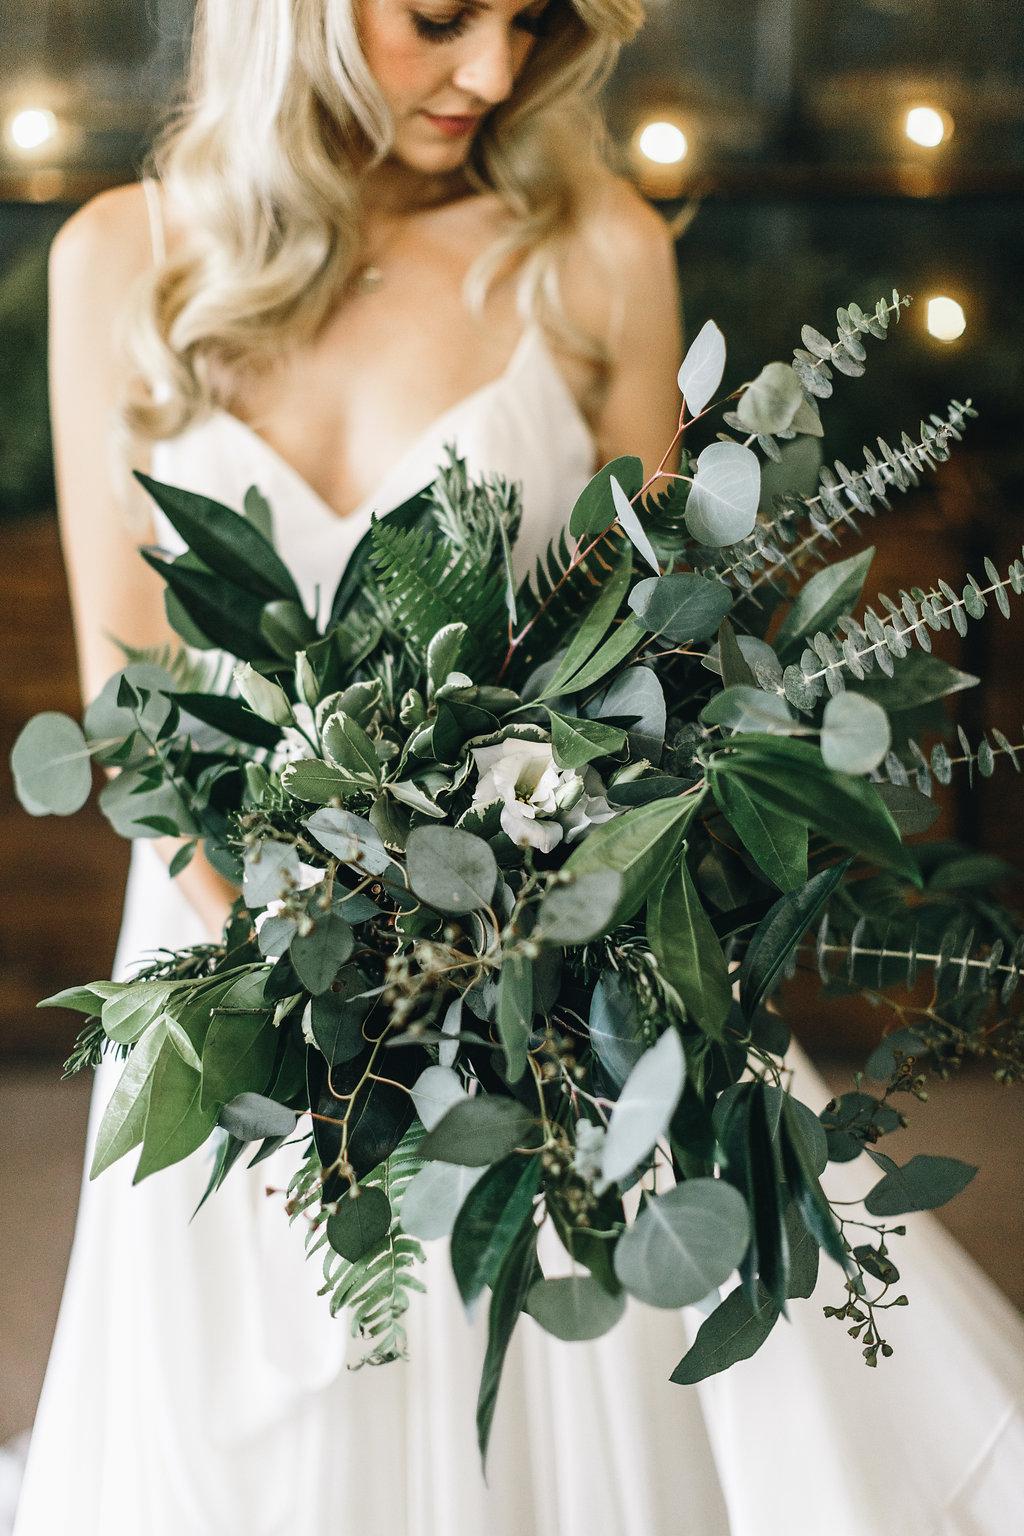 shannon-britt-mackensey-alexander-photography-green-wedding-shoes-ivory-and-beau-bridal-boutique-savannah-wedding-planner-savannah-bridal-boutique-savannah-wedding-dresses-savannah-florist-summer-solstice-wedding-boho-soho-south-cafe-wedding-21.jpg